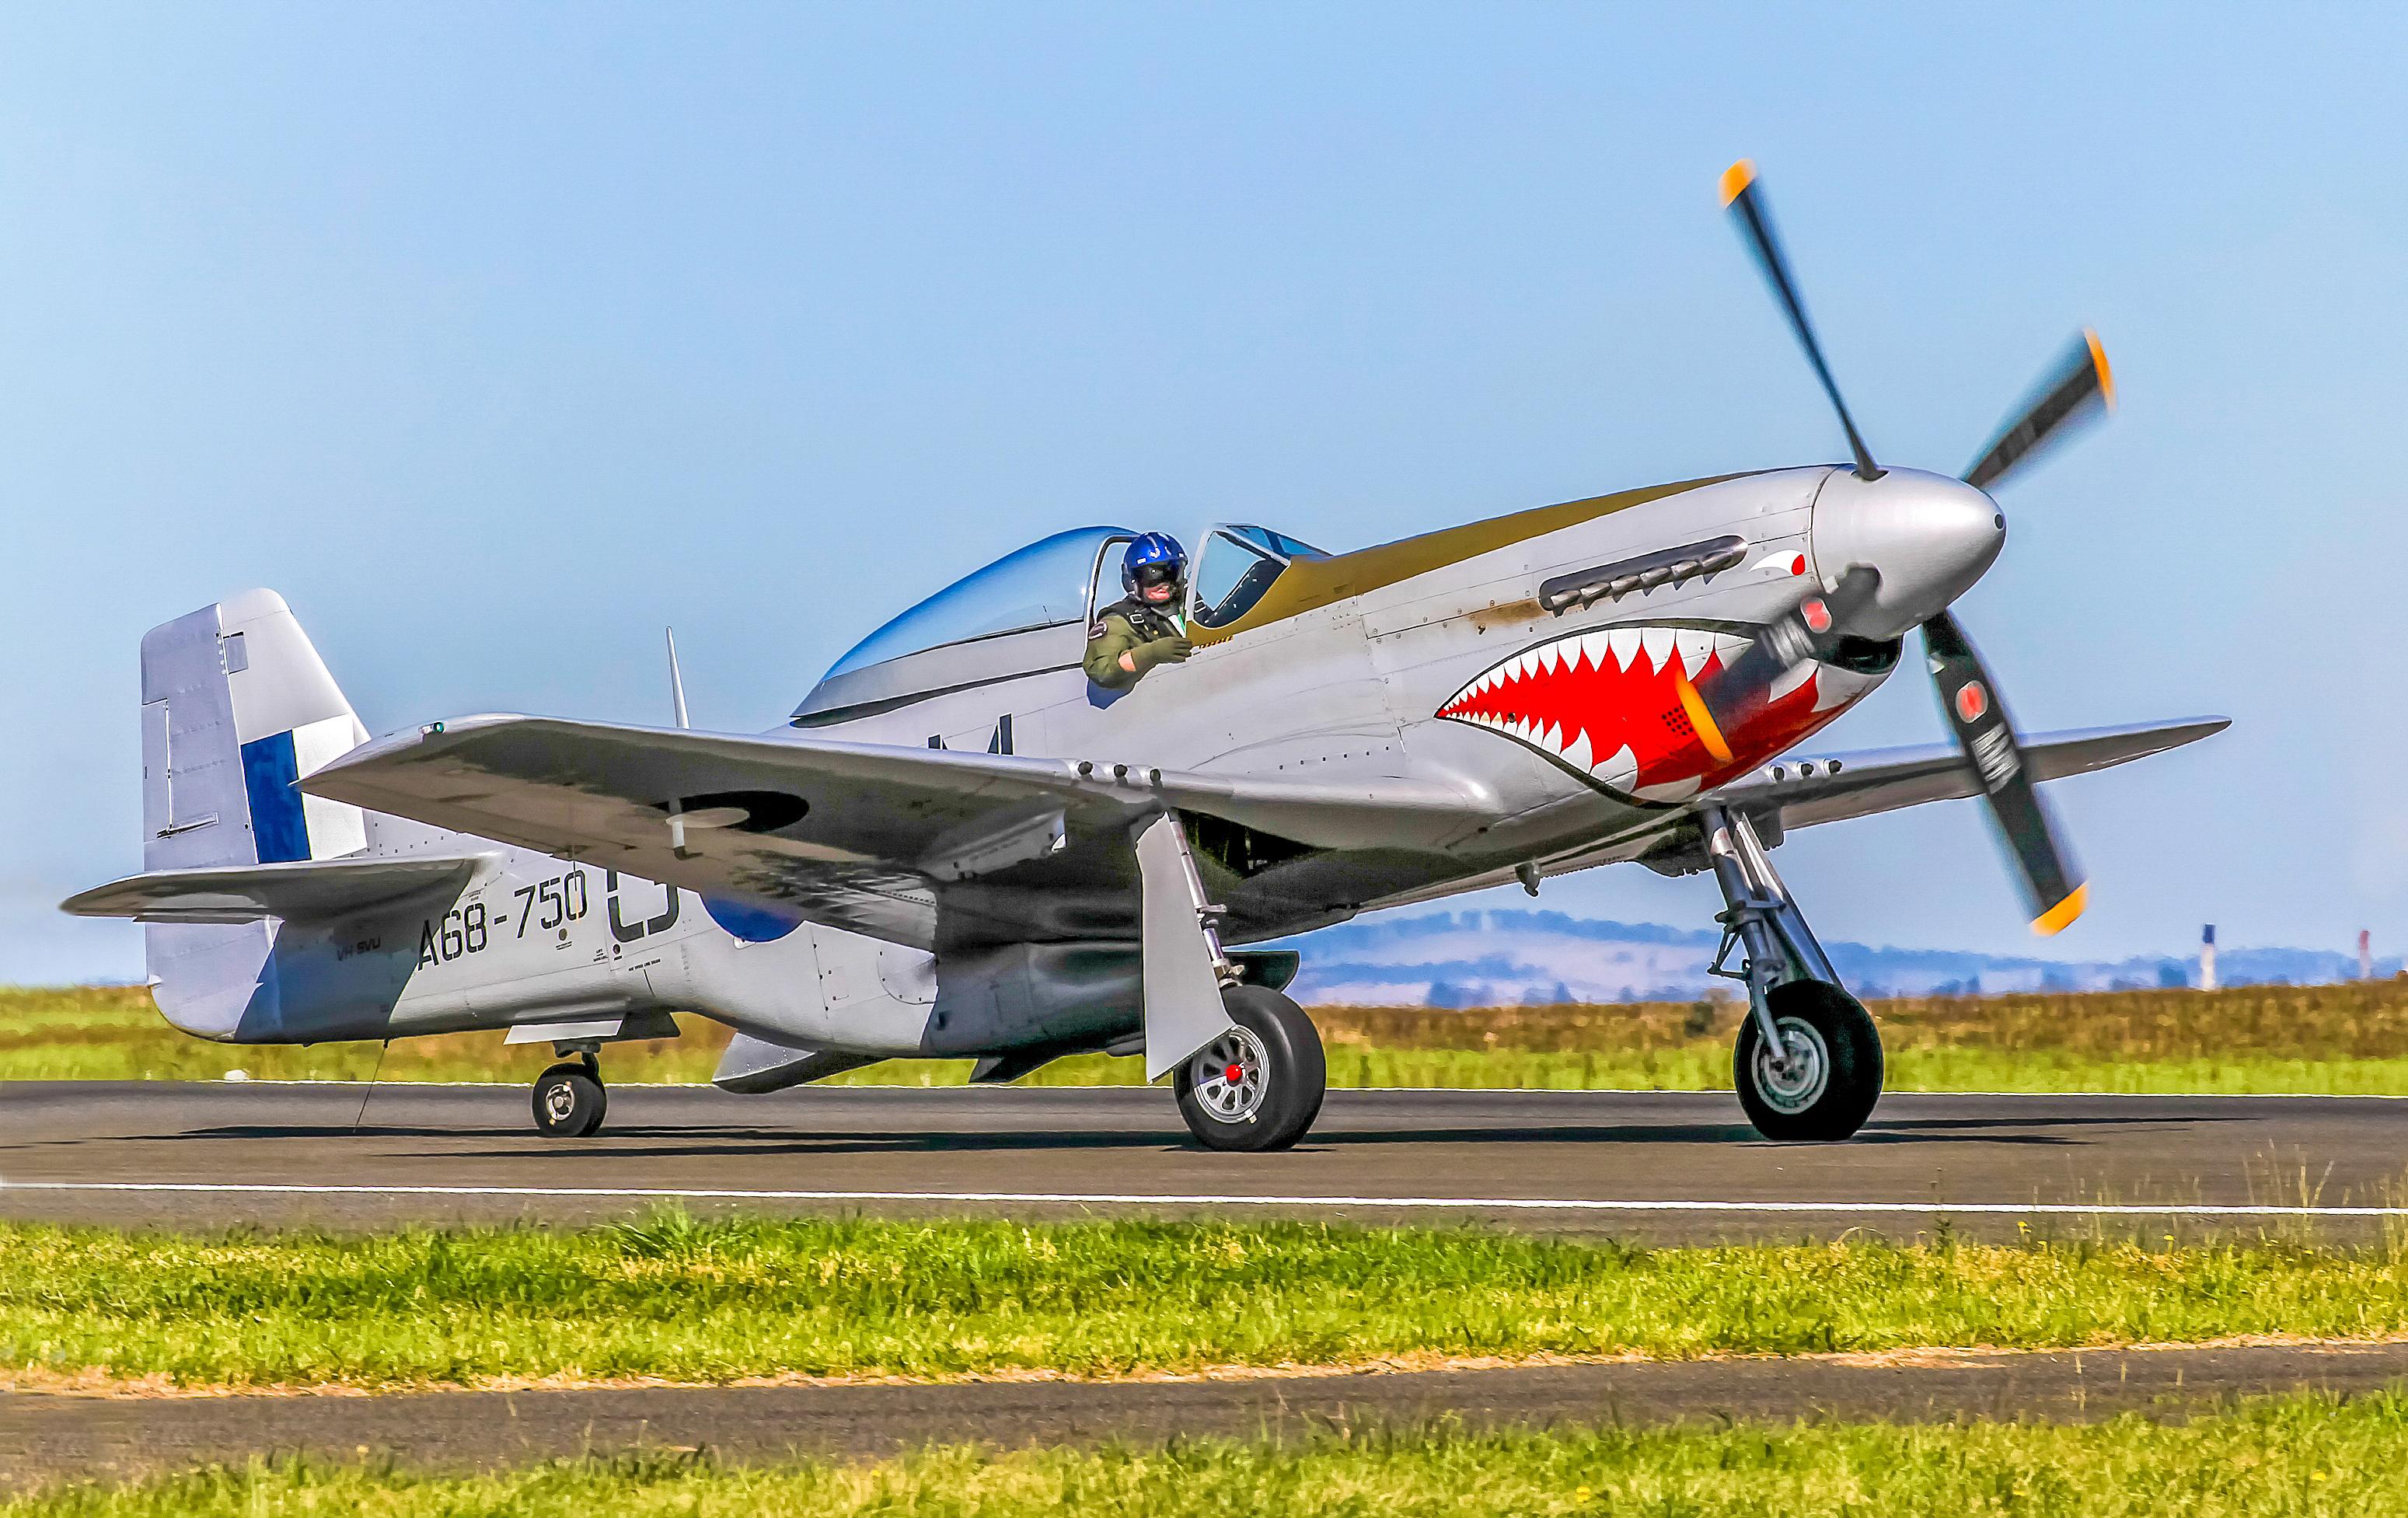 North American P-51 Mustang, North American P-51 Mustang